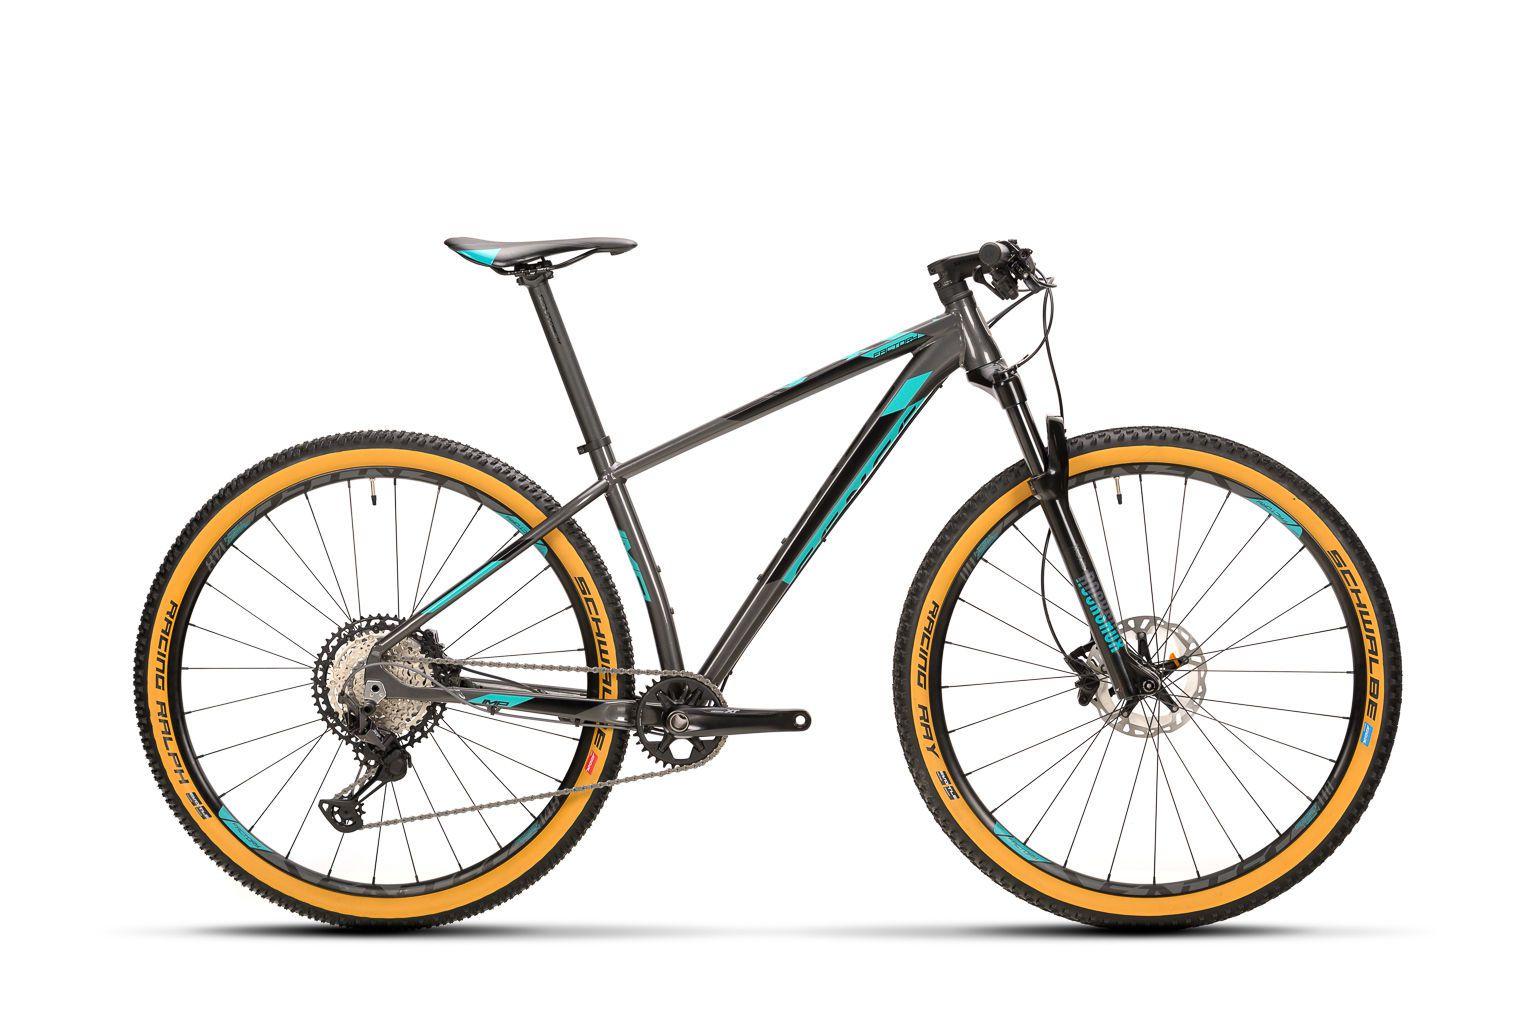 Bicicleta SENSE Impact Factory 2020 - 12v Shimano XT - Cinza/Acqua